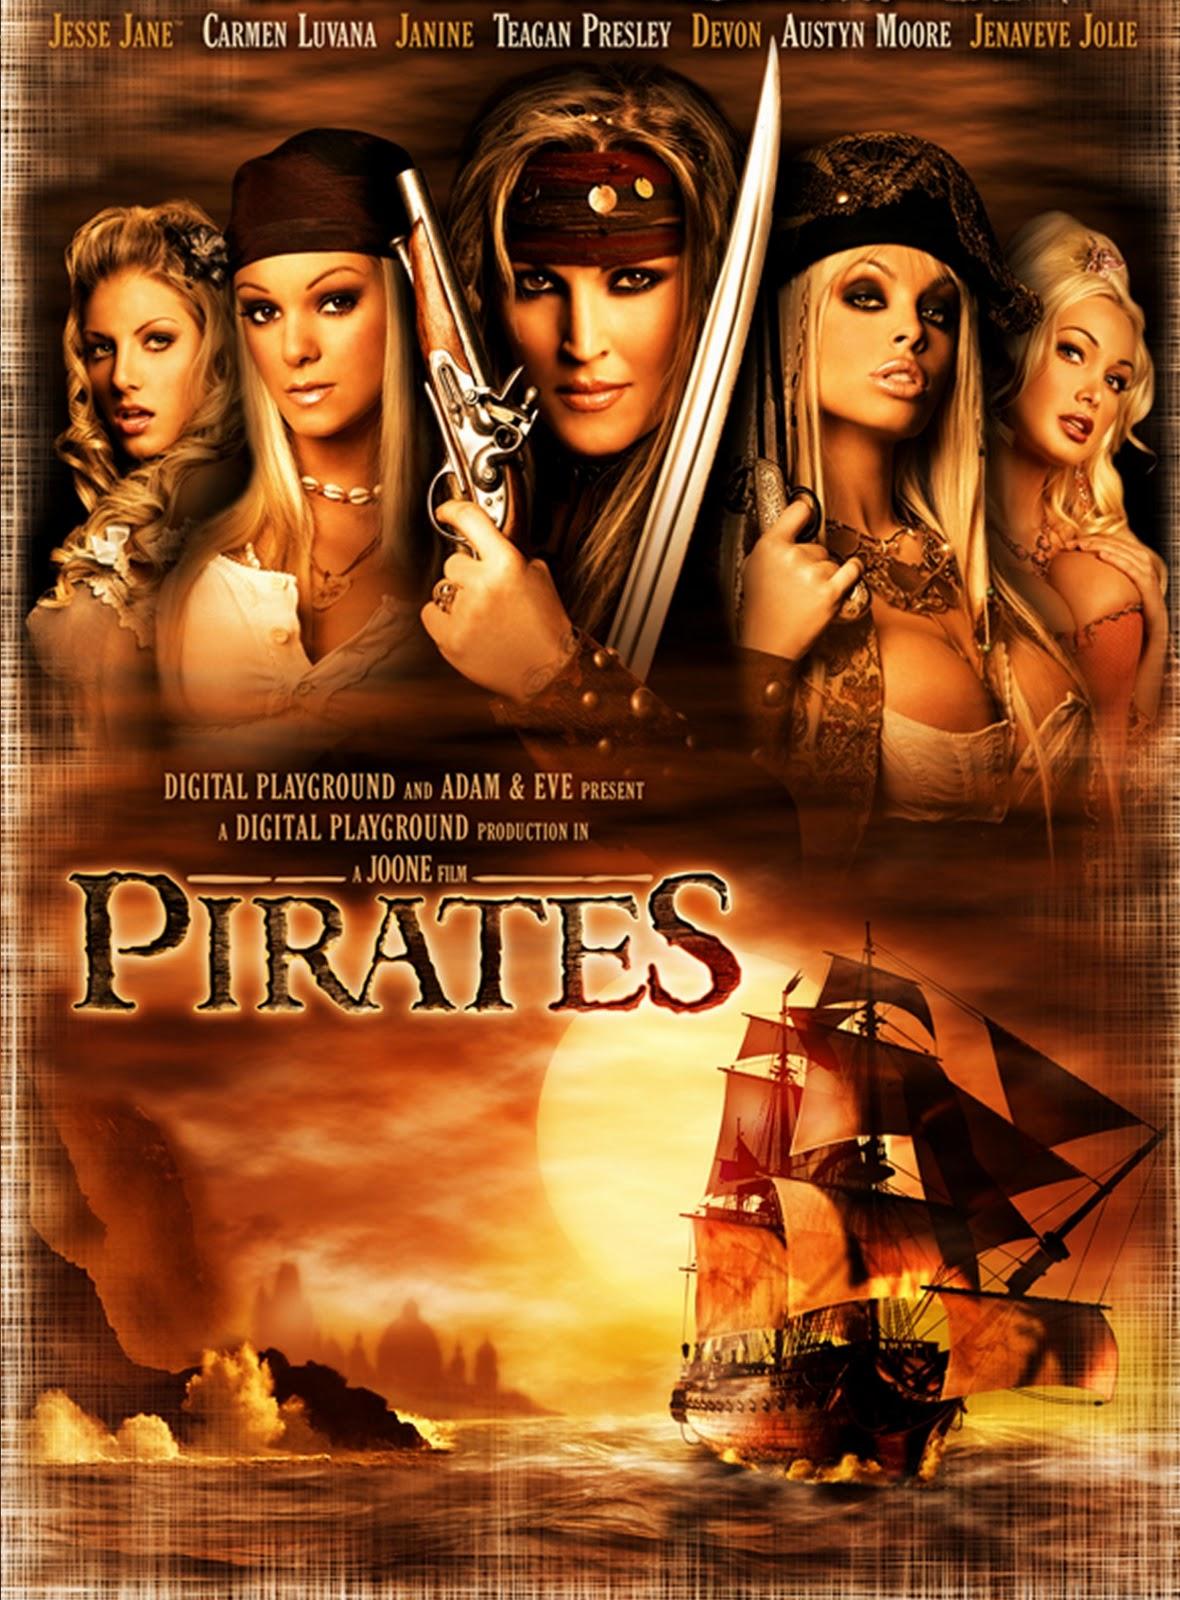 Порно фильм pirates 2 stagnetti s revenge смотреть онлайн